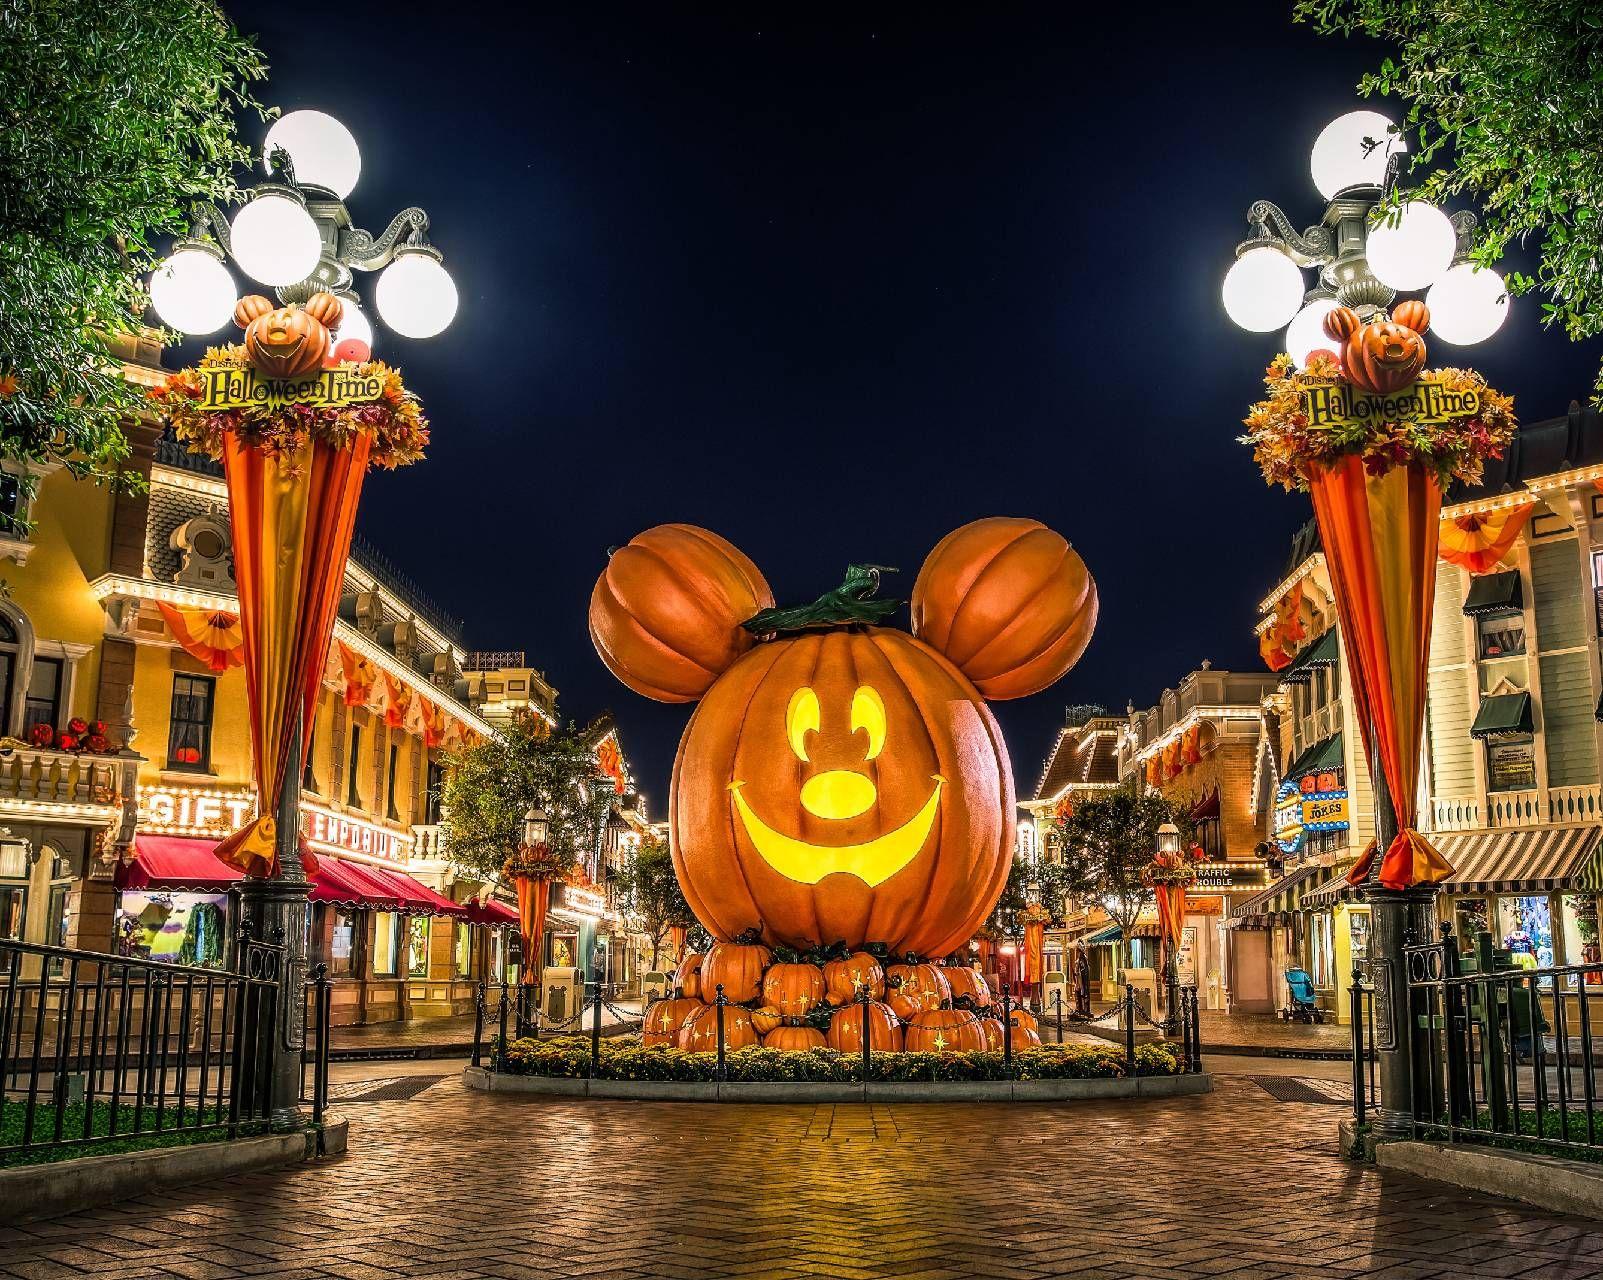 Download Halloween Wallpaper By Mattthevamp 43 Free On Zedge Now Browse Millions Of Popular Dis Halloween Wallpaper Mickey Halloween Disneyland Halloween